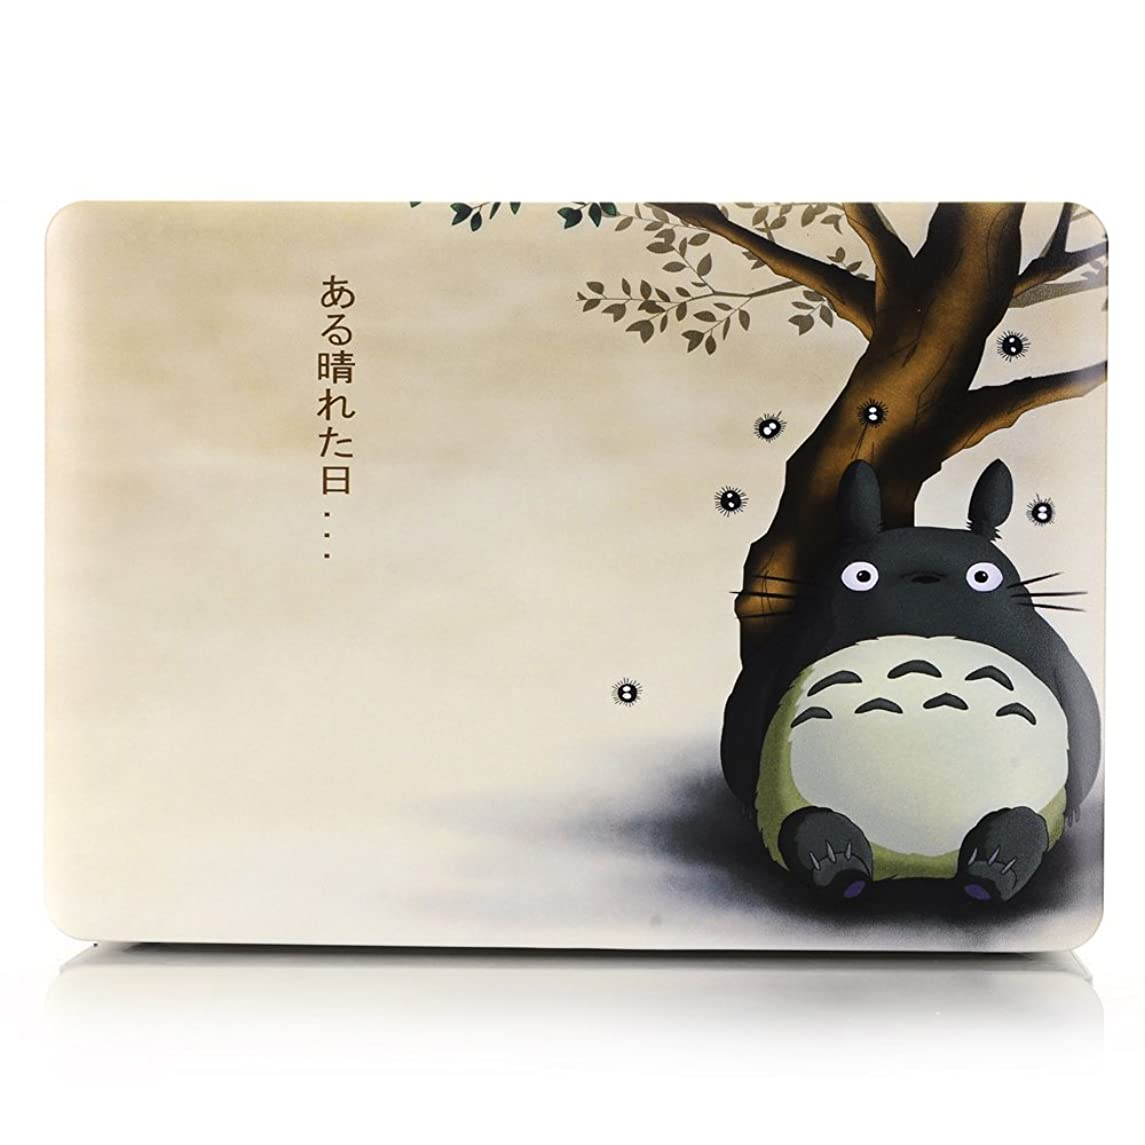 SAYA Waterproof Anti-Fingerprint Hard Case Cover for Old MacBook Pro 13 Inch Model Number A 1278(Black Yellow)